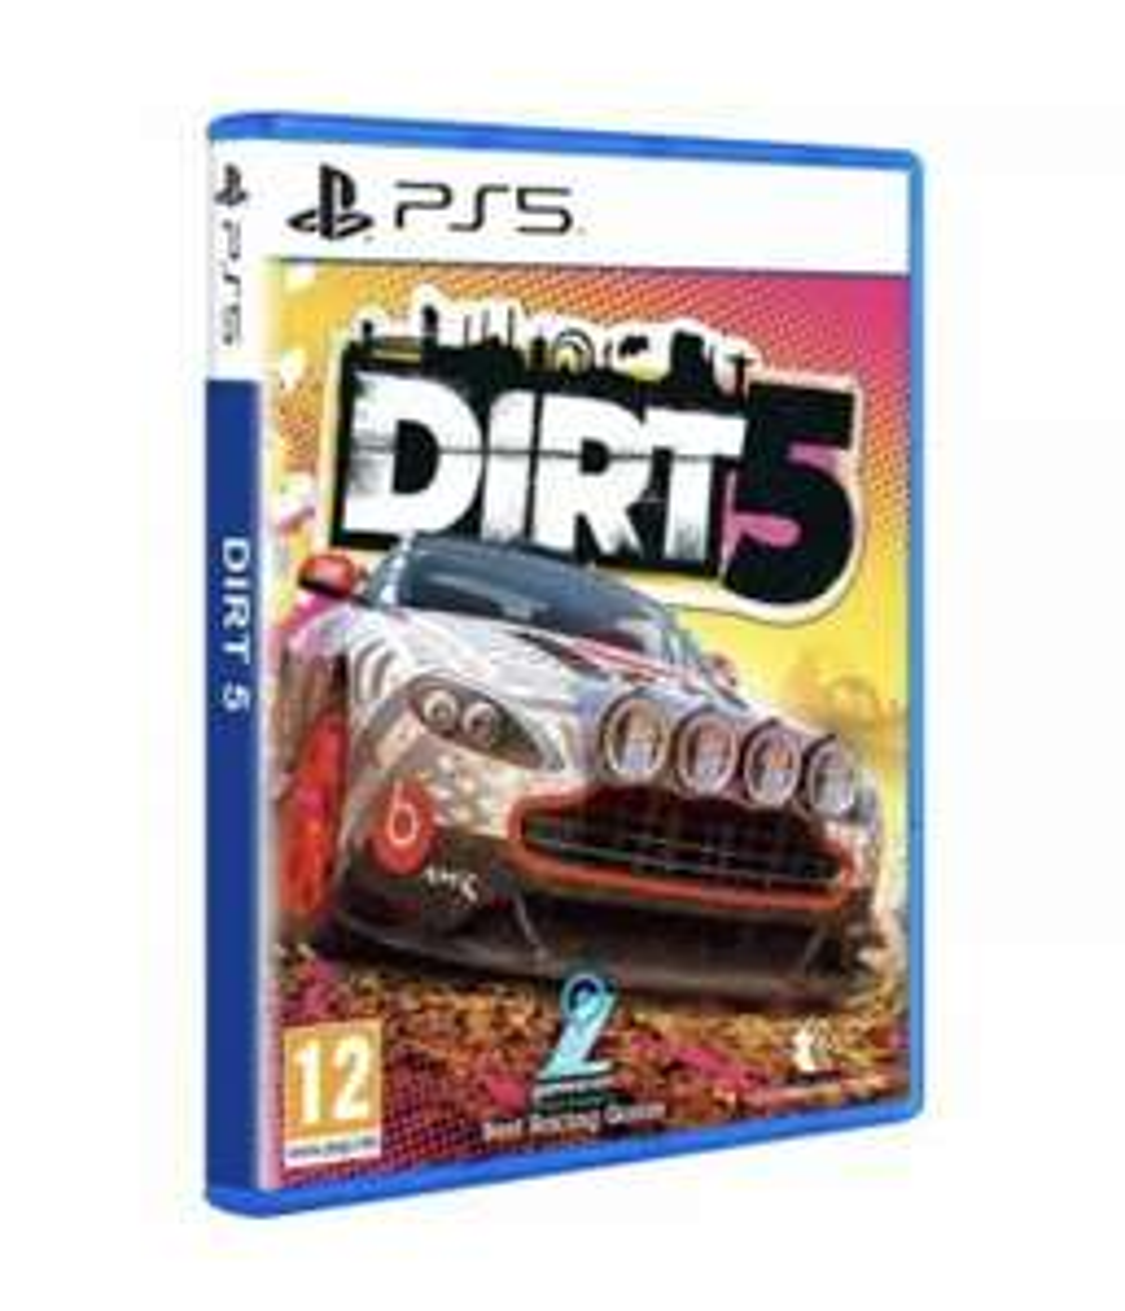 Dirt 5 PS5 (Pre-Order) £40.79 @ ShopTo eBay